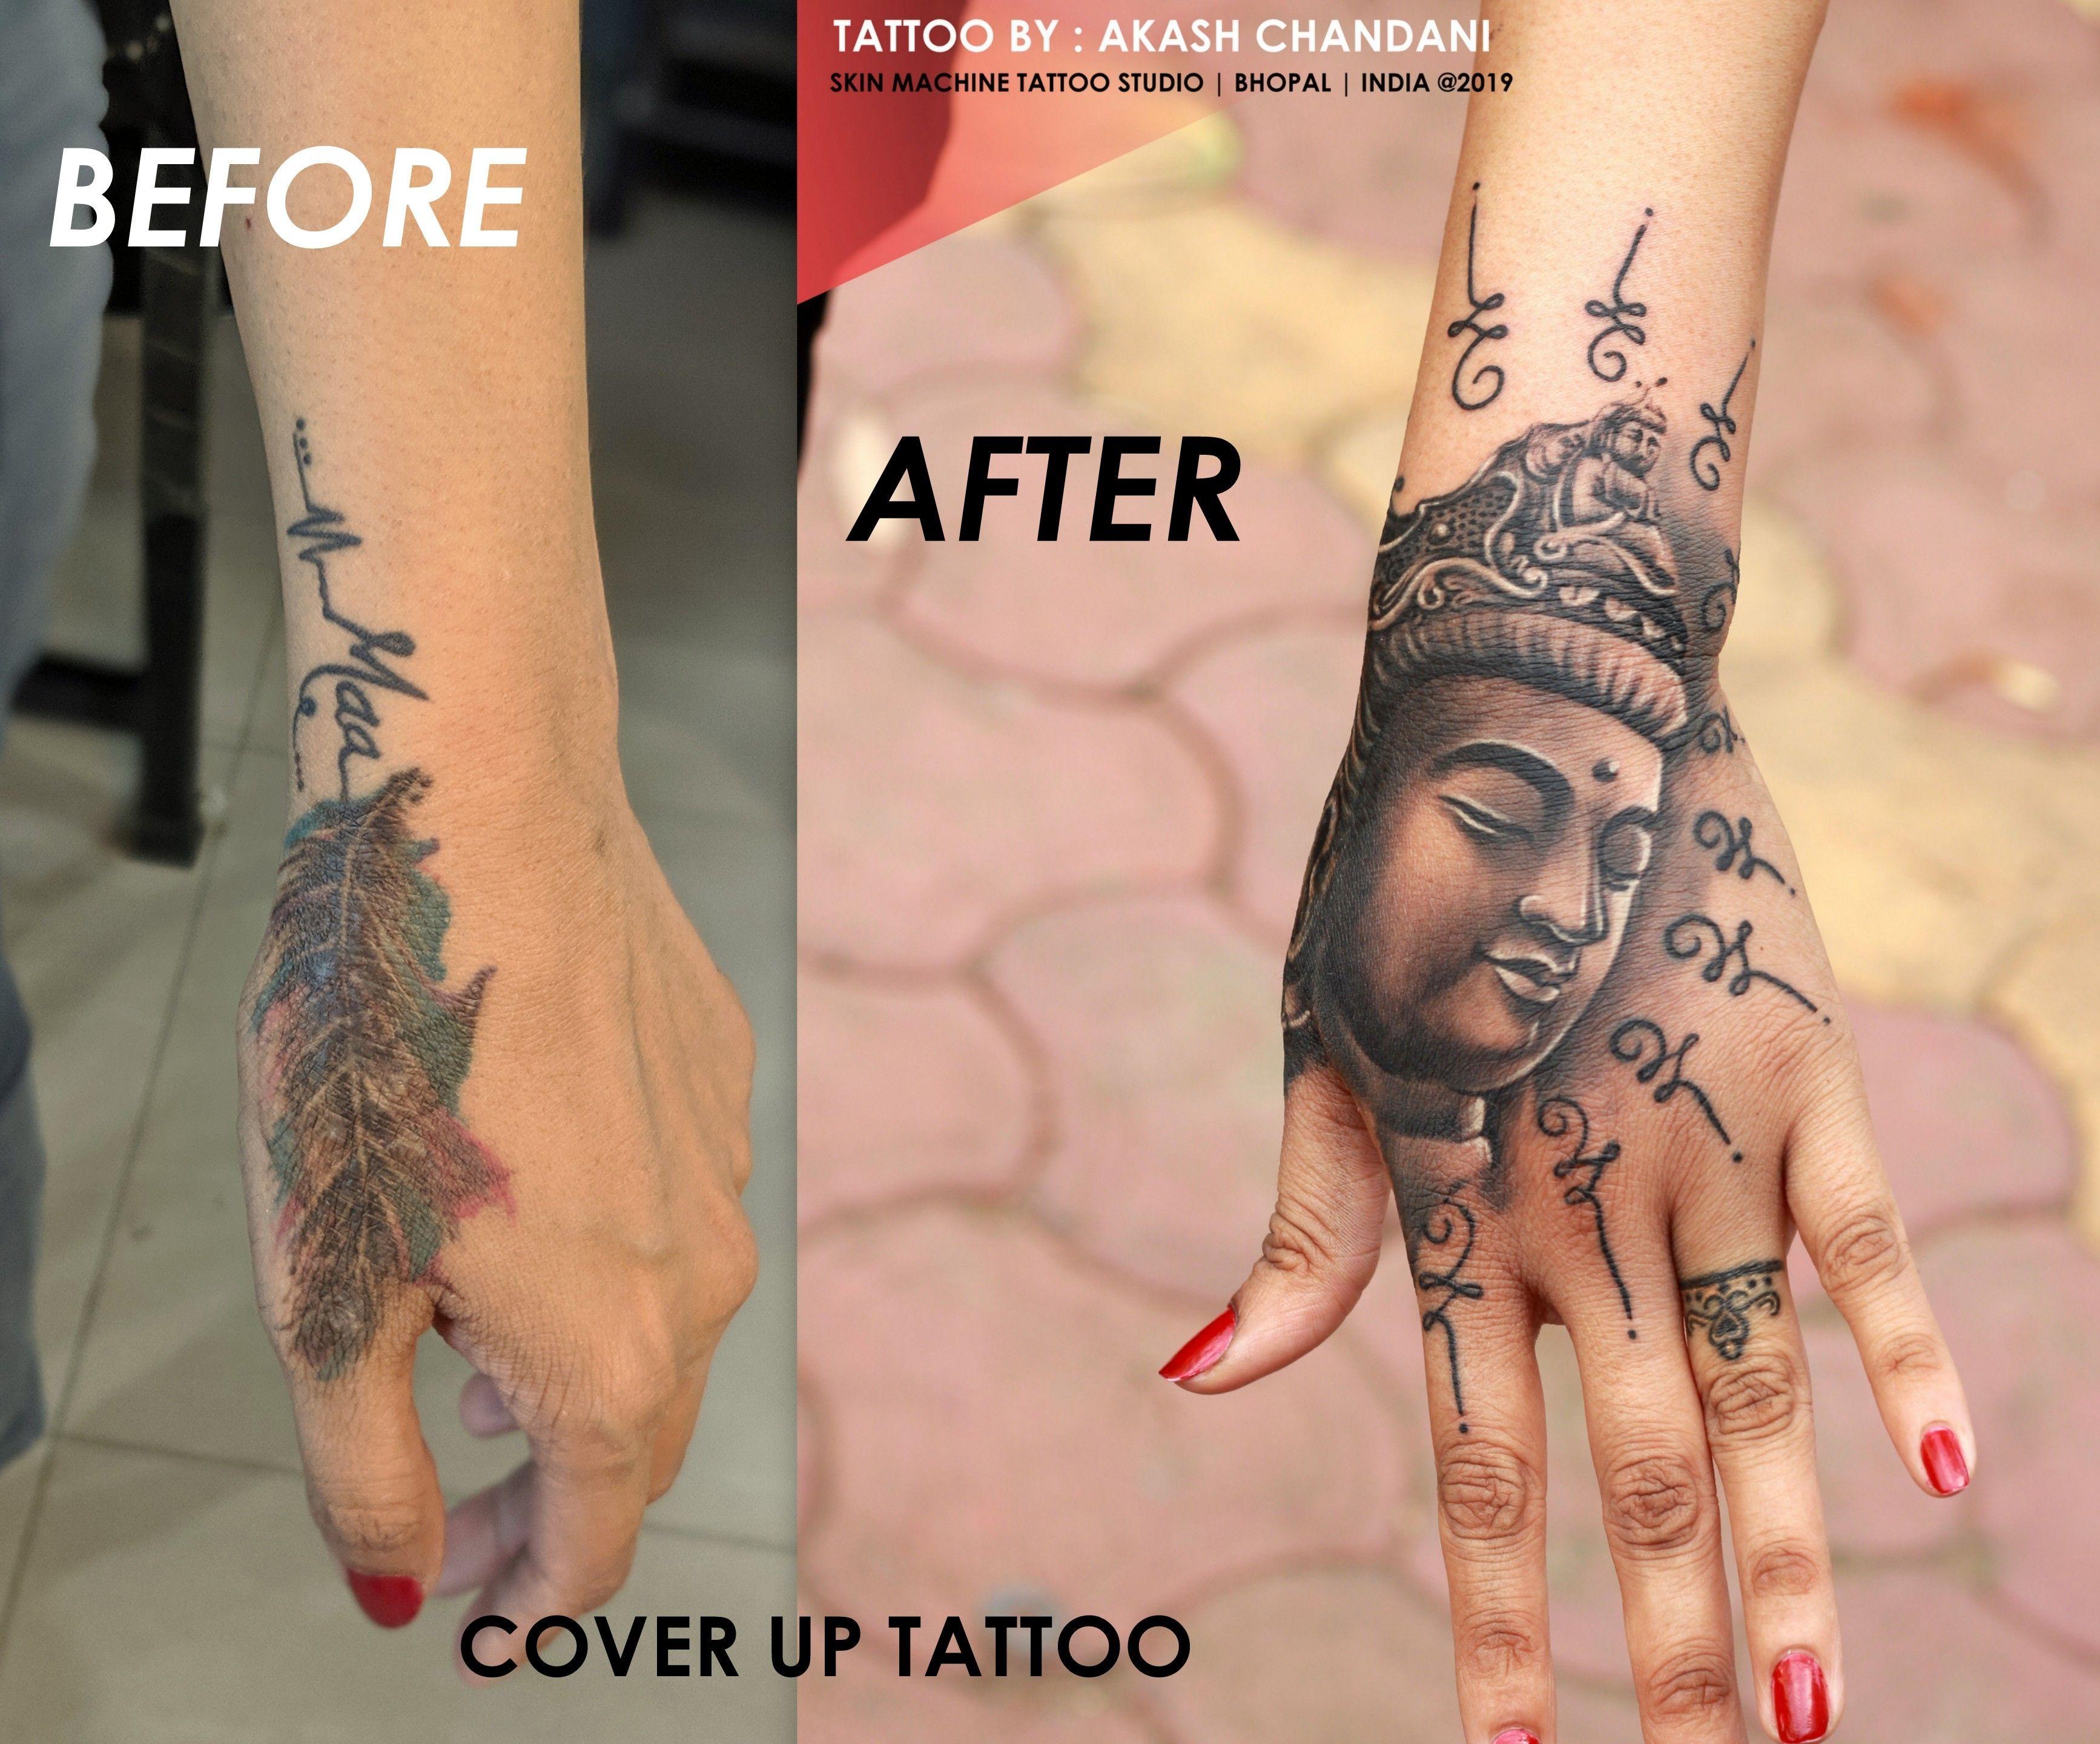 Cover Up Tattoo In 2020 Tattoo Studio Hand Tattoo Cover Up Buddha Tattoo Sleeve